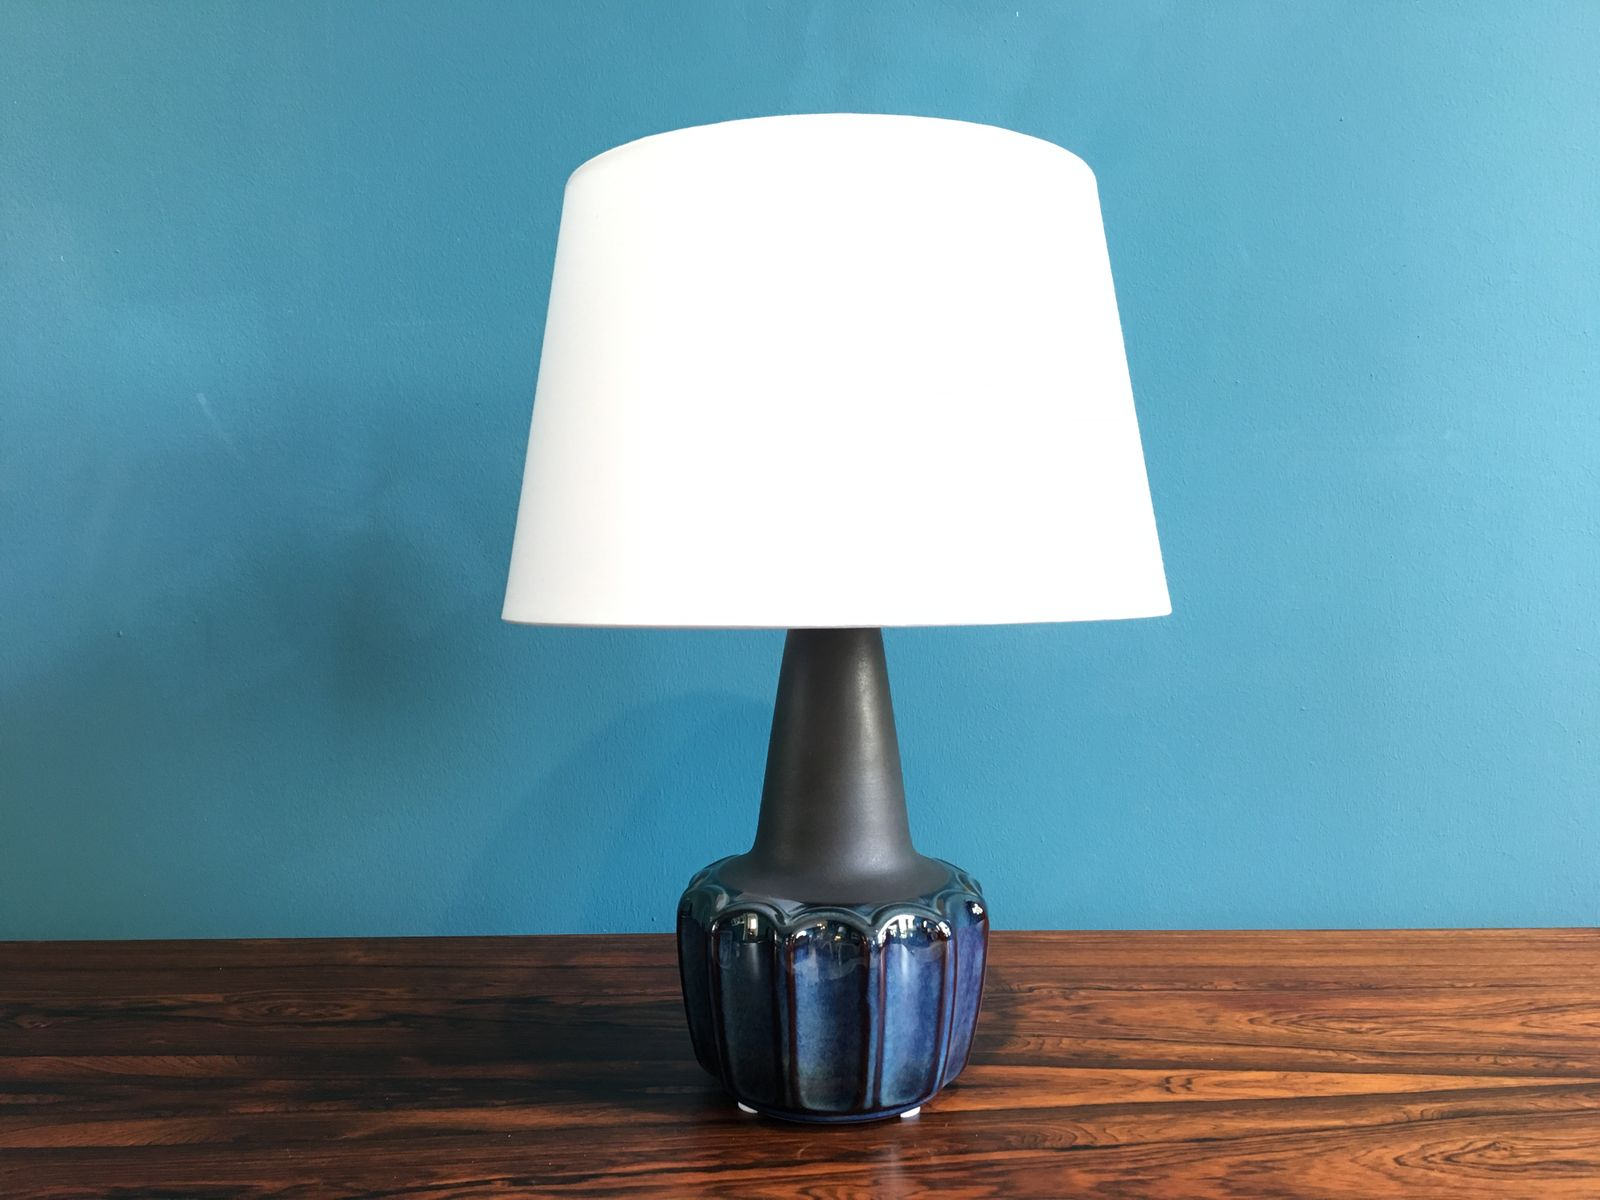 Vintage Danish Ceramic Table Lamp By Einar Johansen For